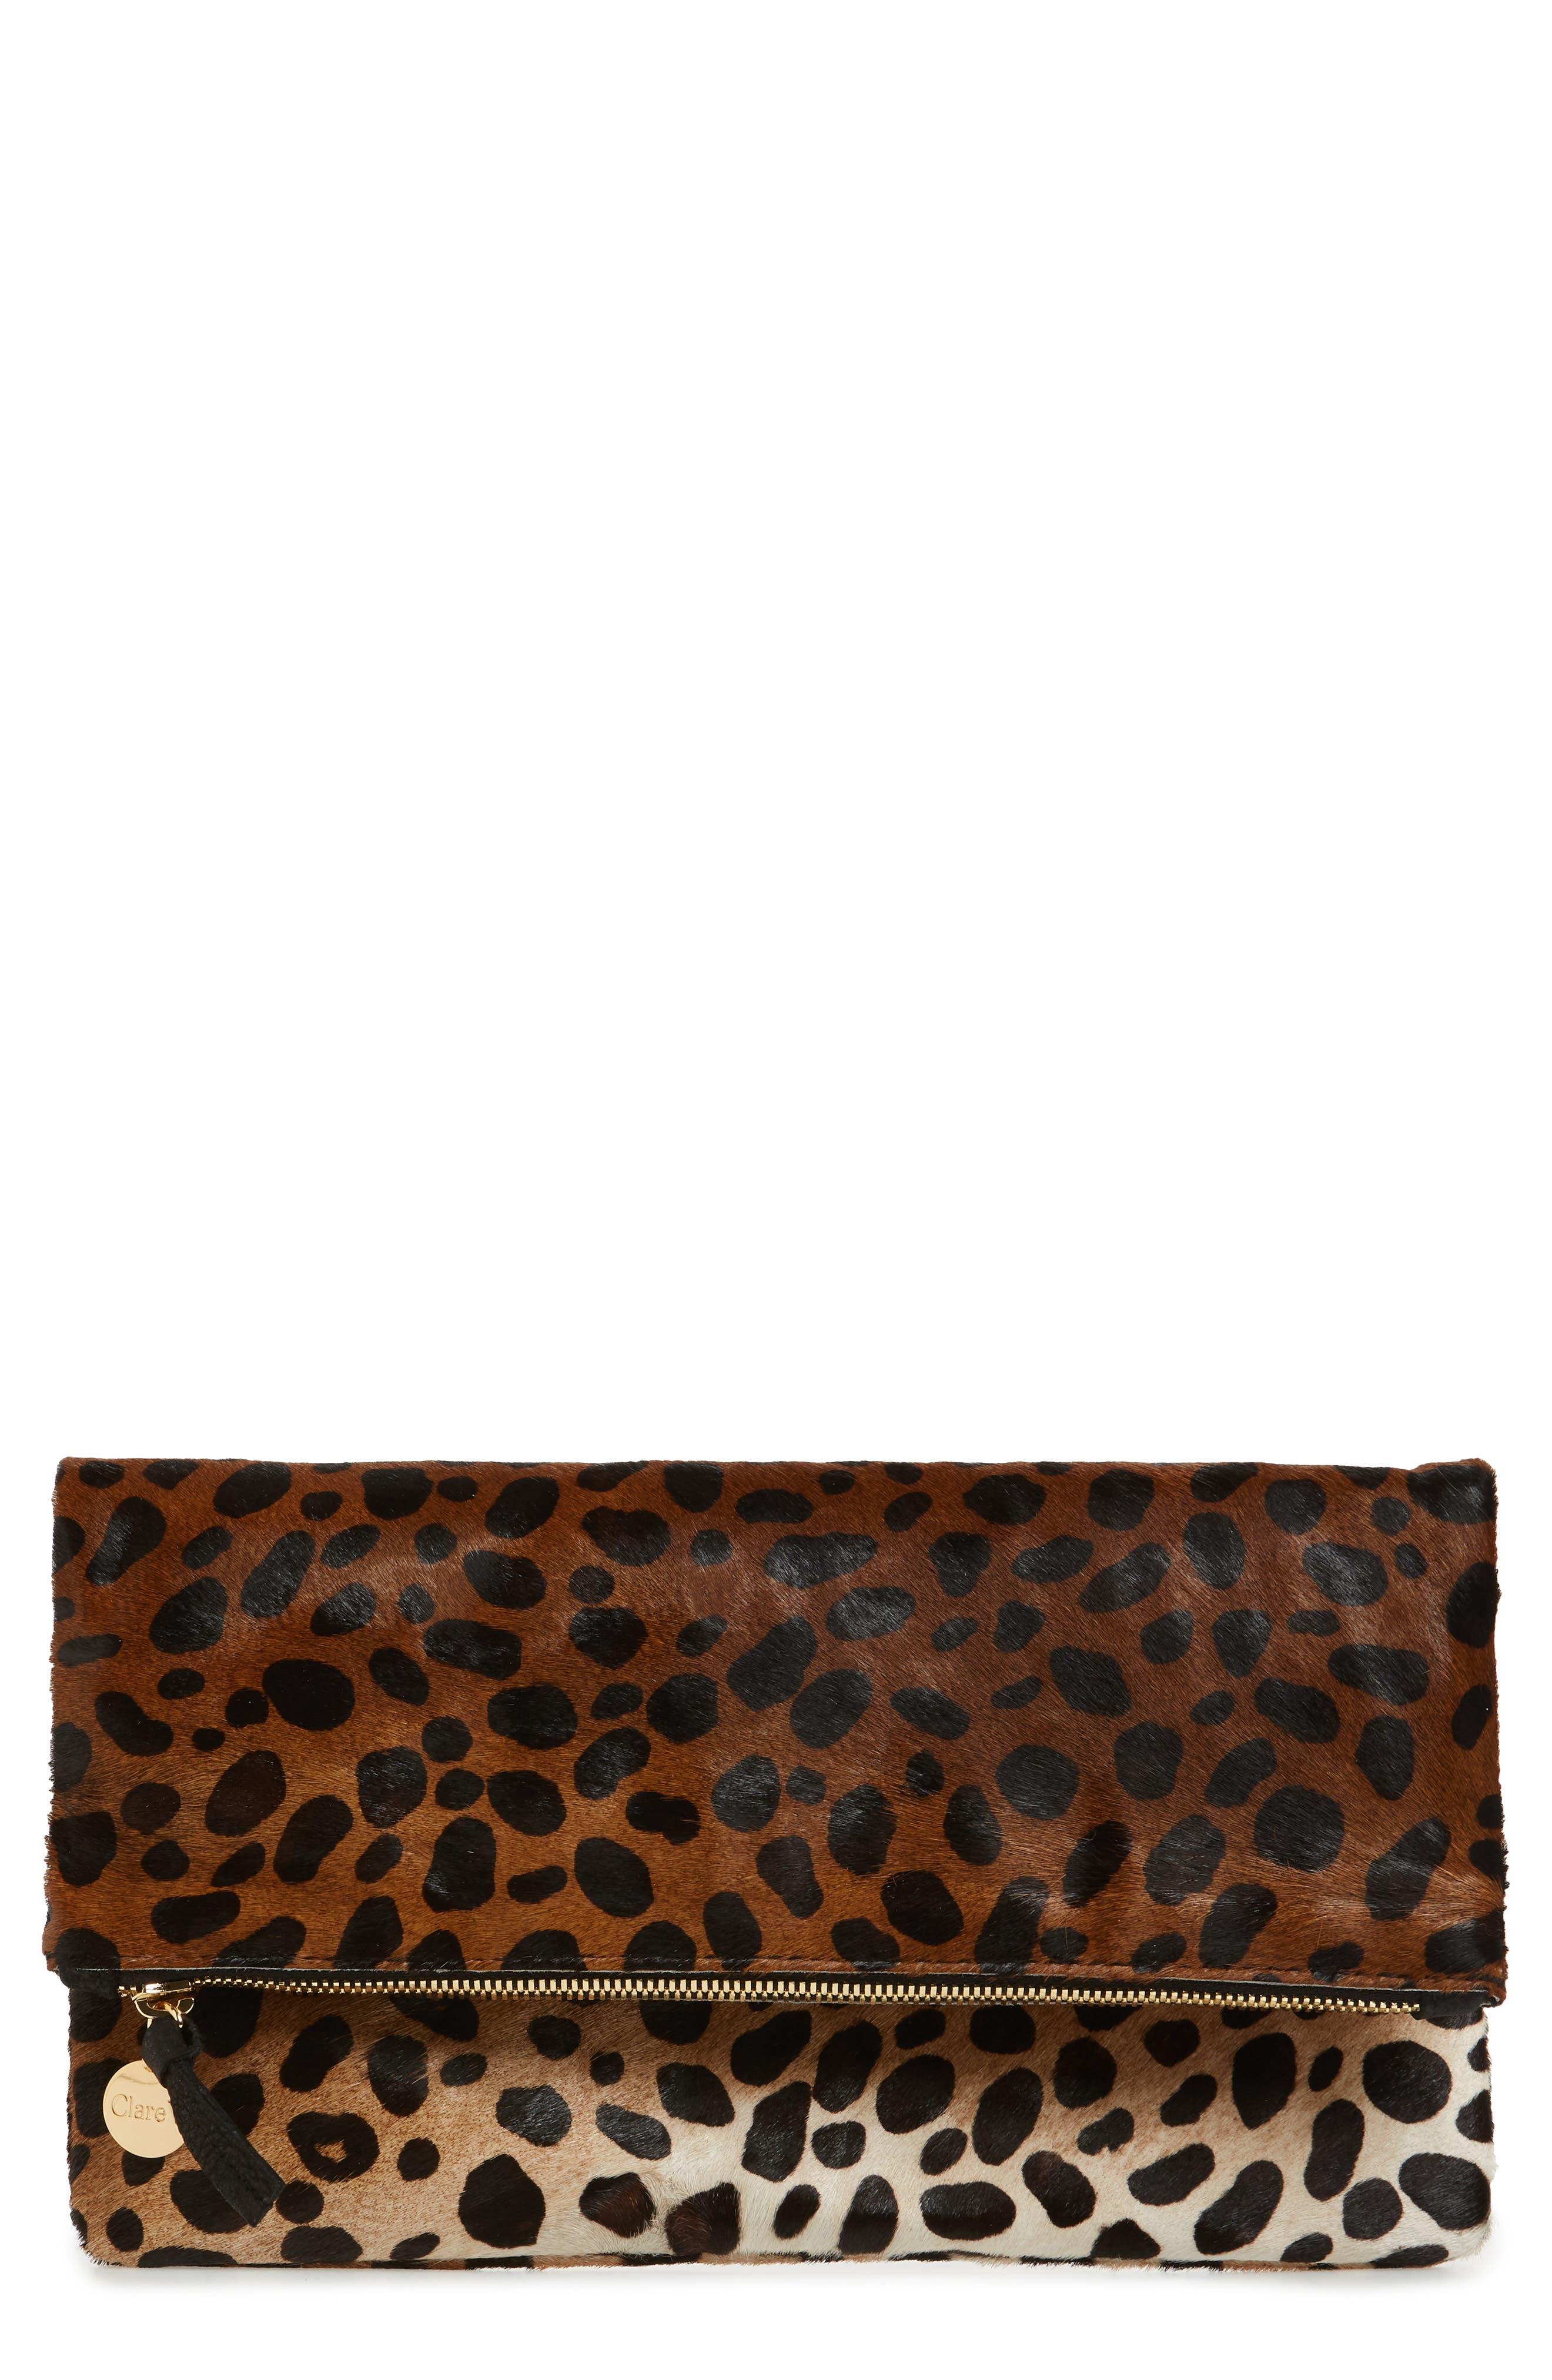 CLARE V. Genuine Calf Hair Leopard Print Foldover Clutch, Main, color, 203